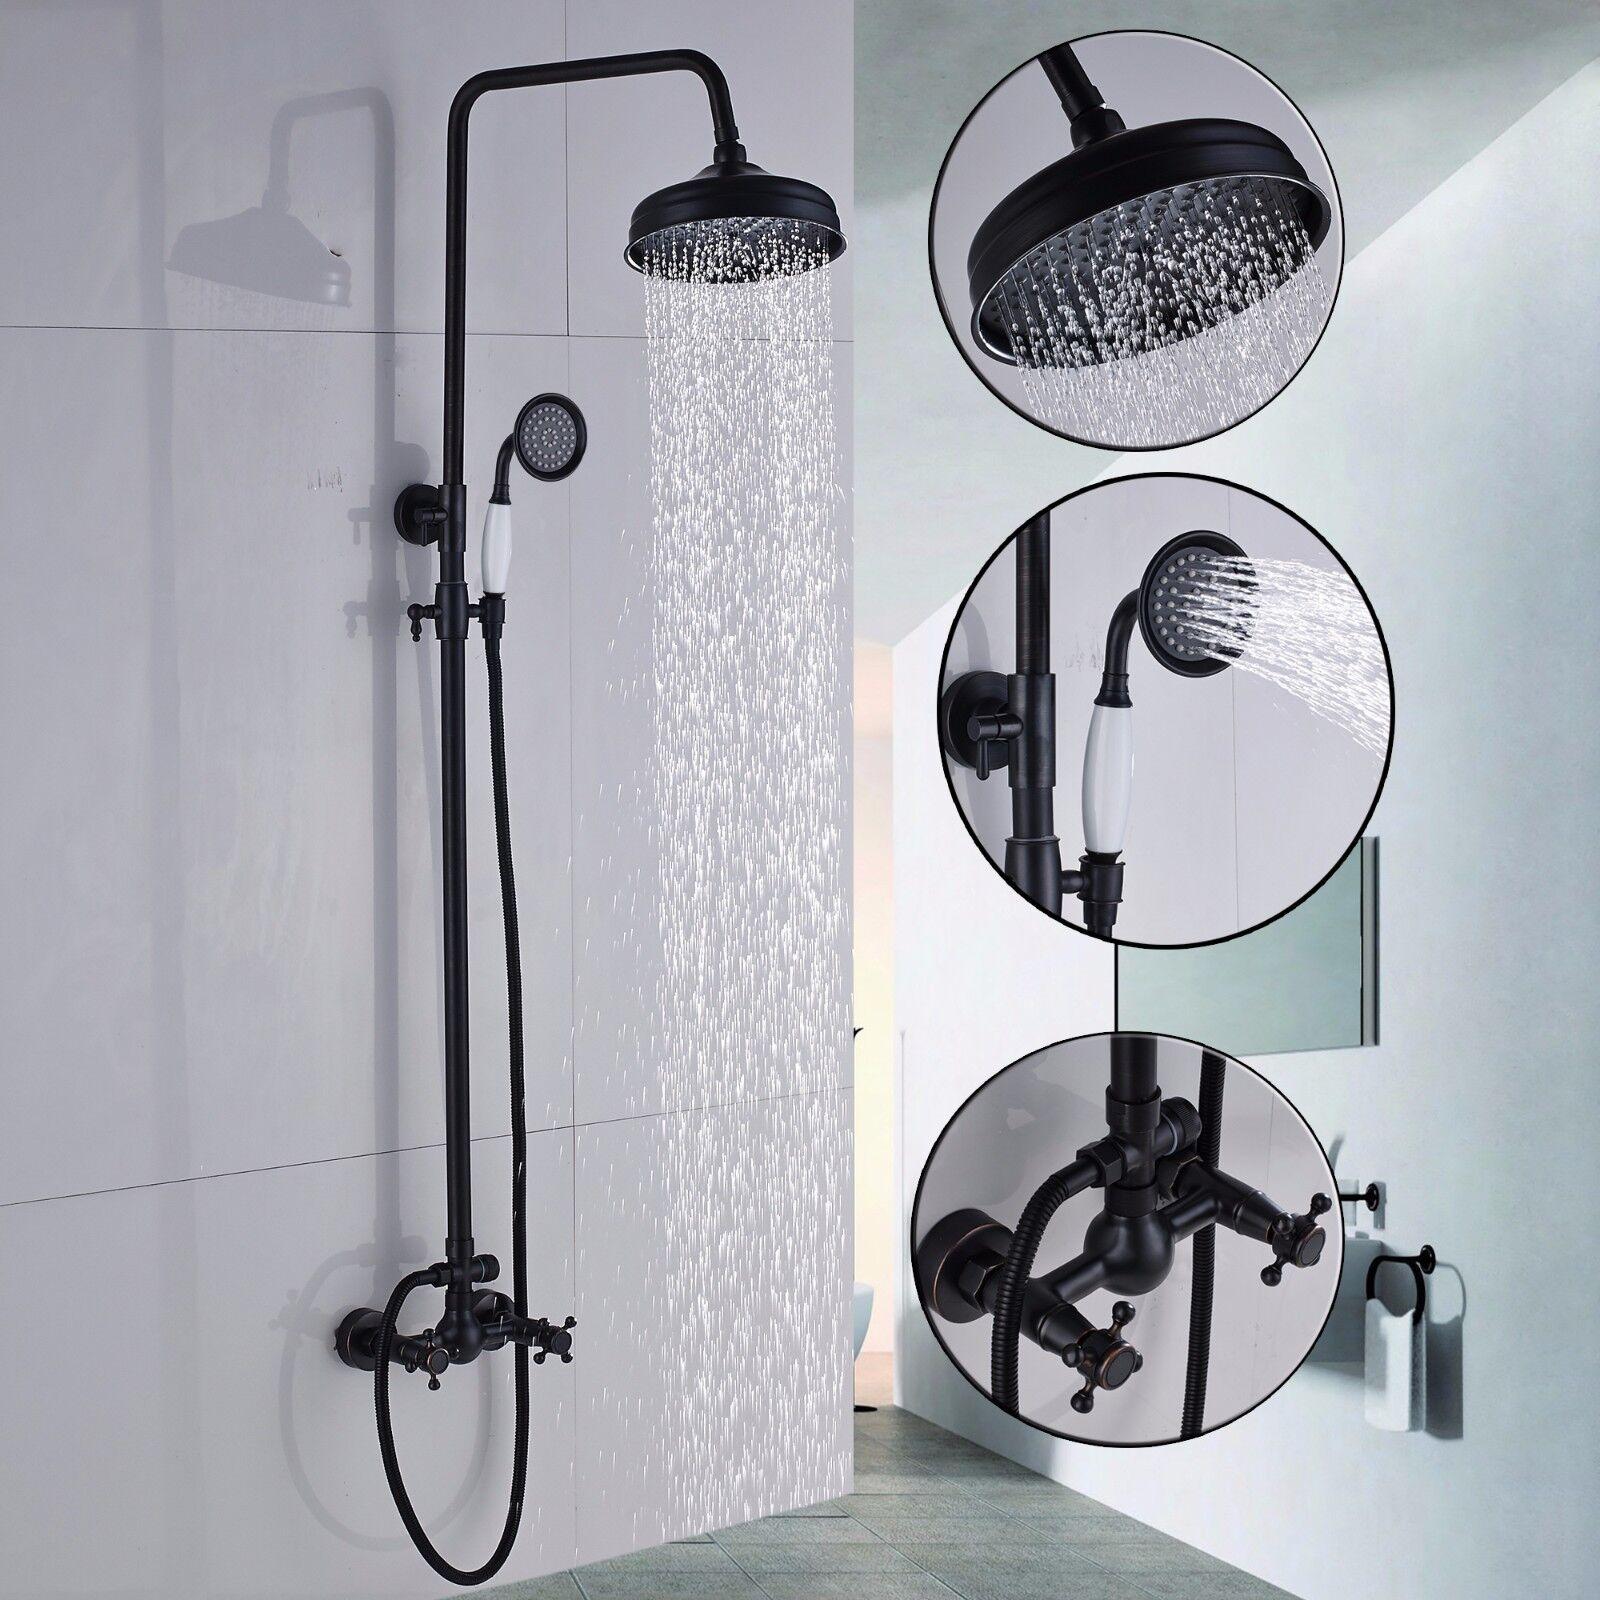 Oil Rubbed Bronze Shower Faucet Set Mixer Rain Shower Head Tap Hand Sprayer Tap